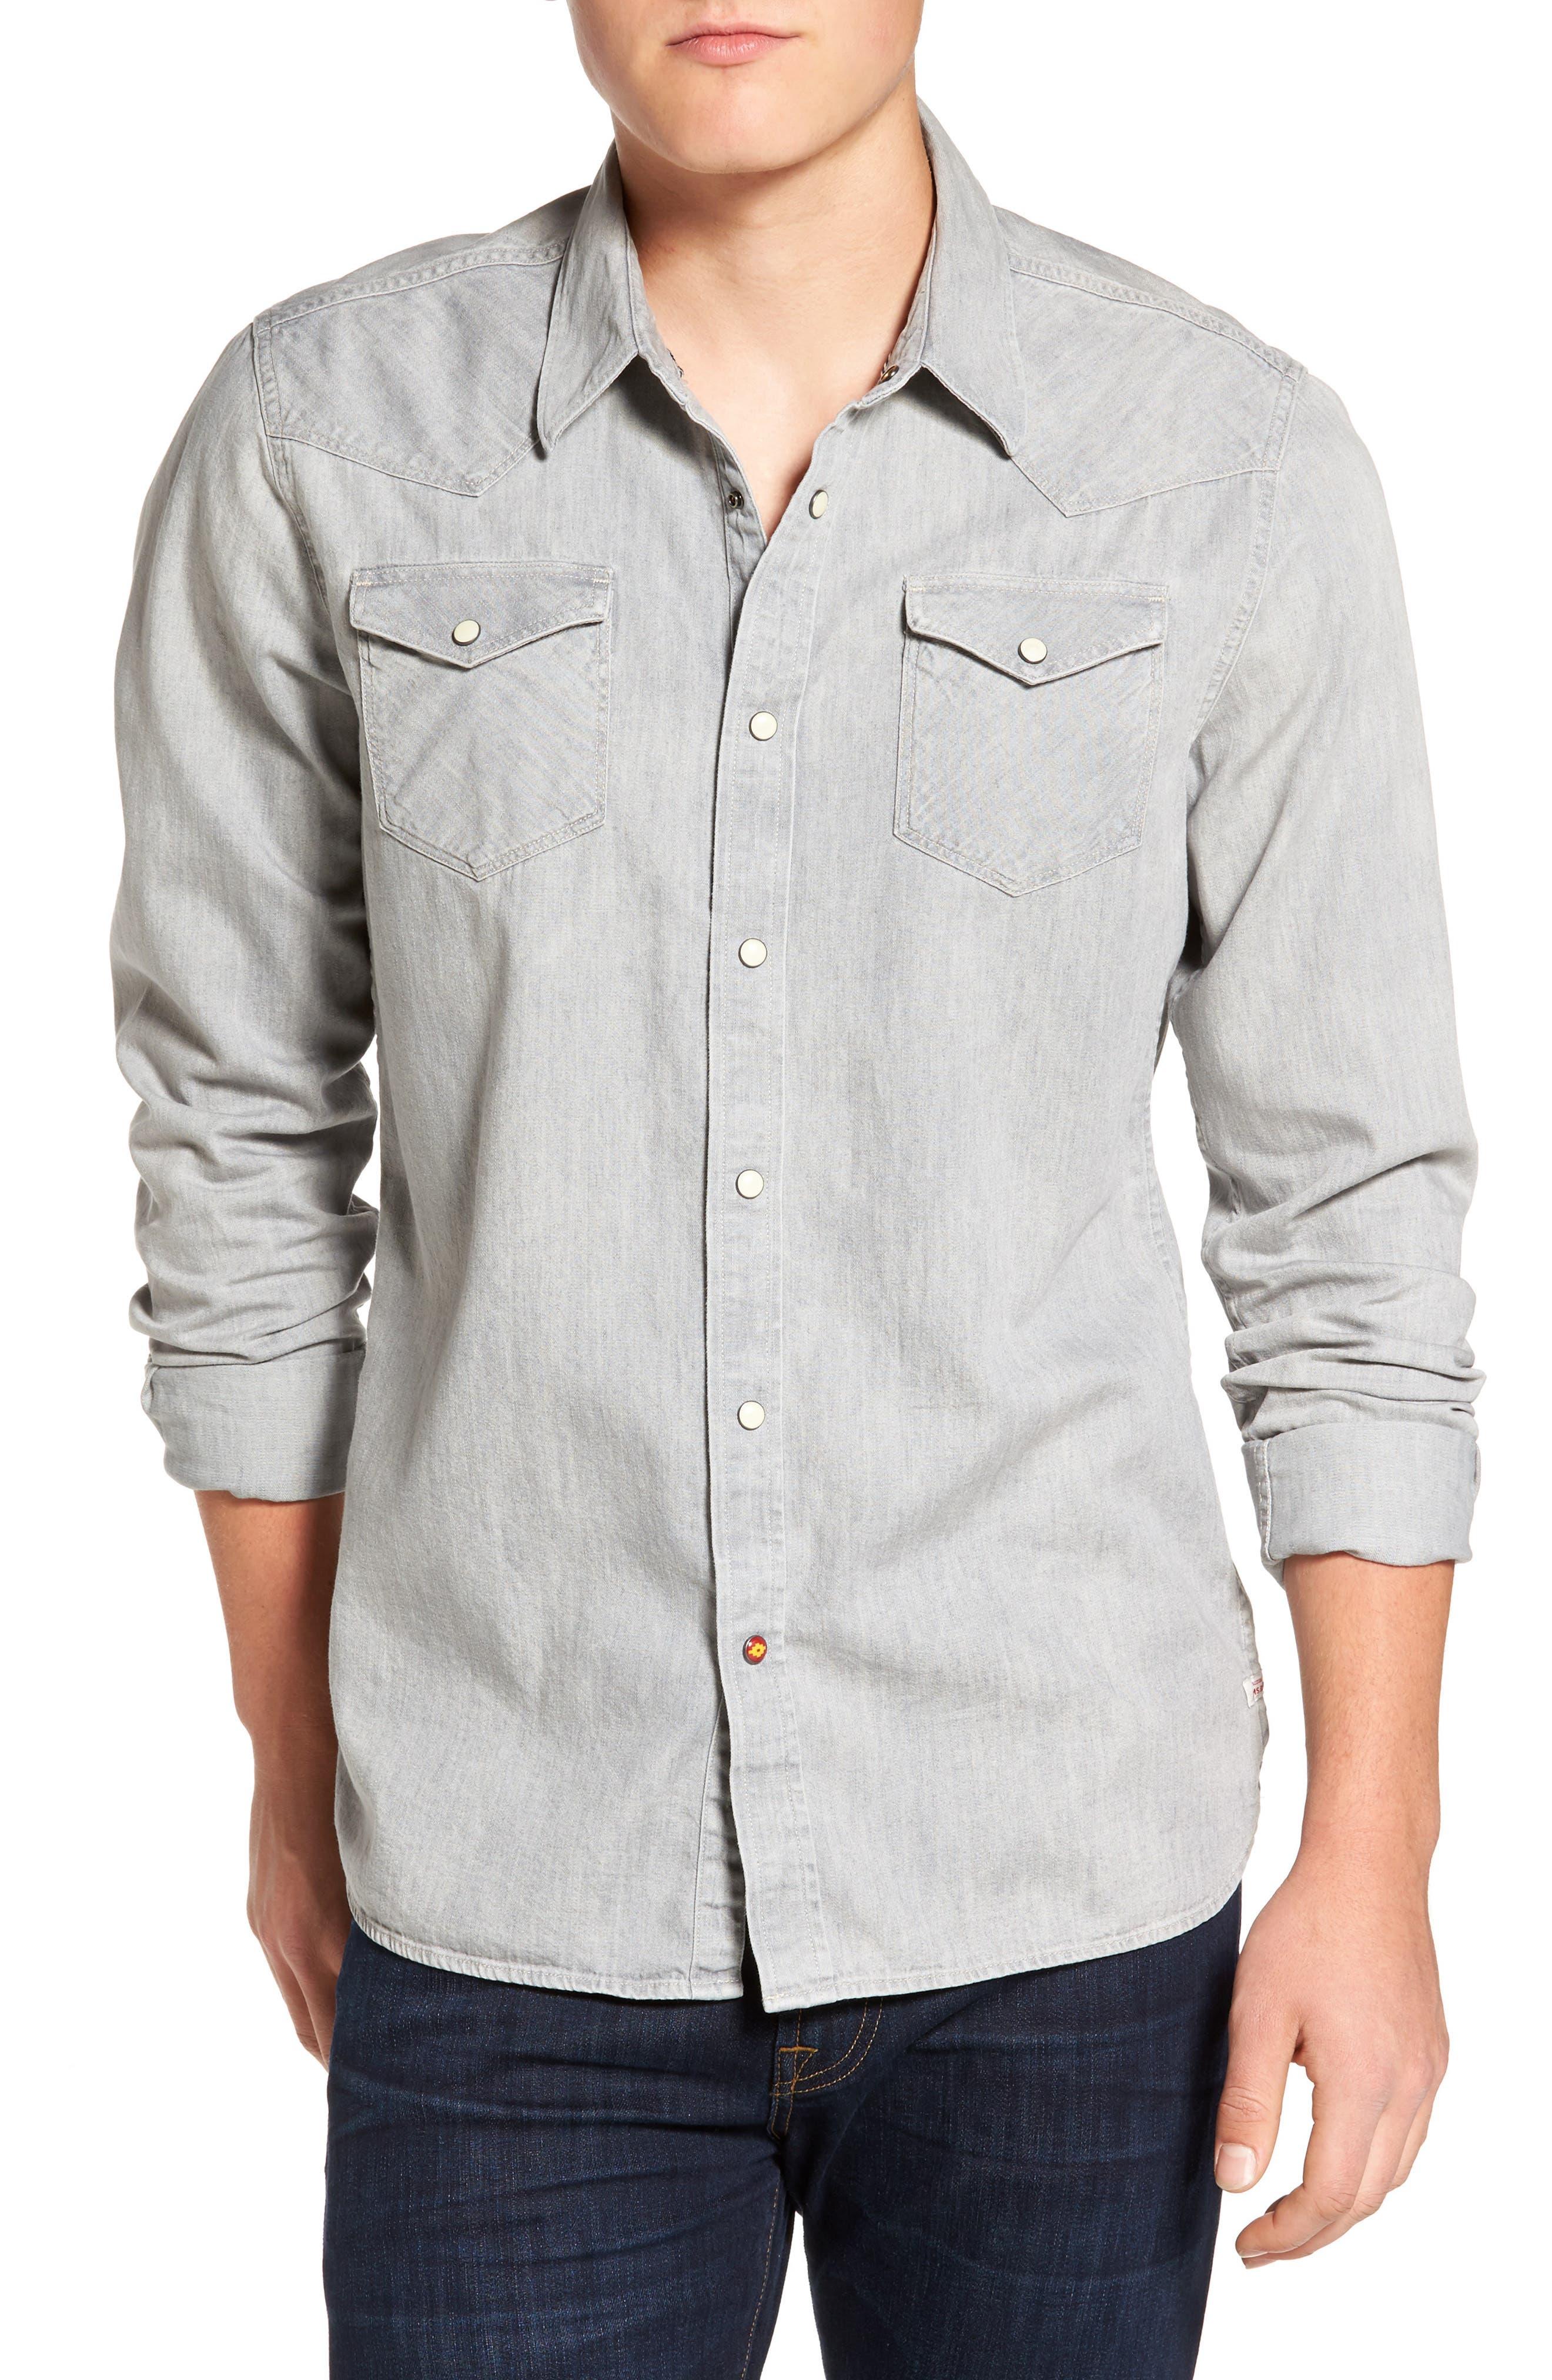 Alternate Image 1 Selected - Scotch & Soda Western Shirt